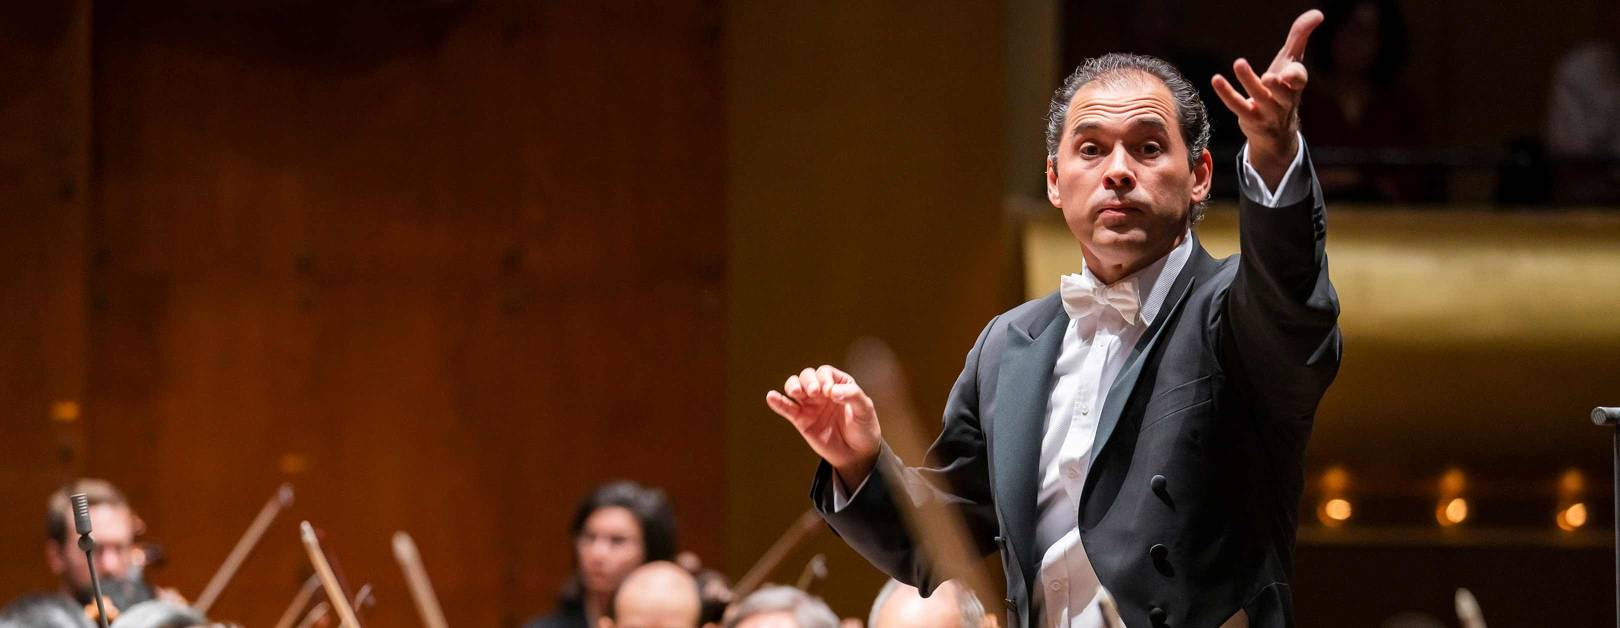 CANCELLED: Prokofiev's Symphony No. 5